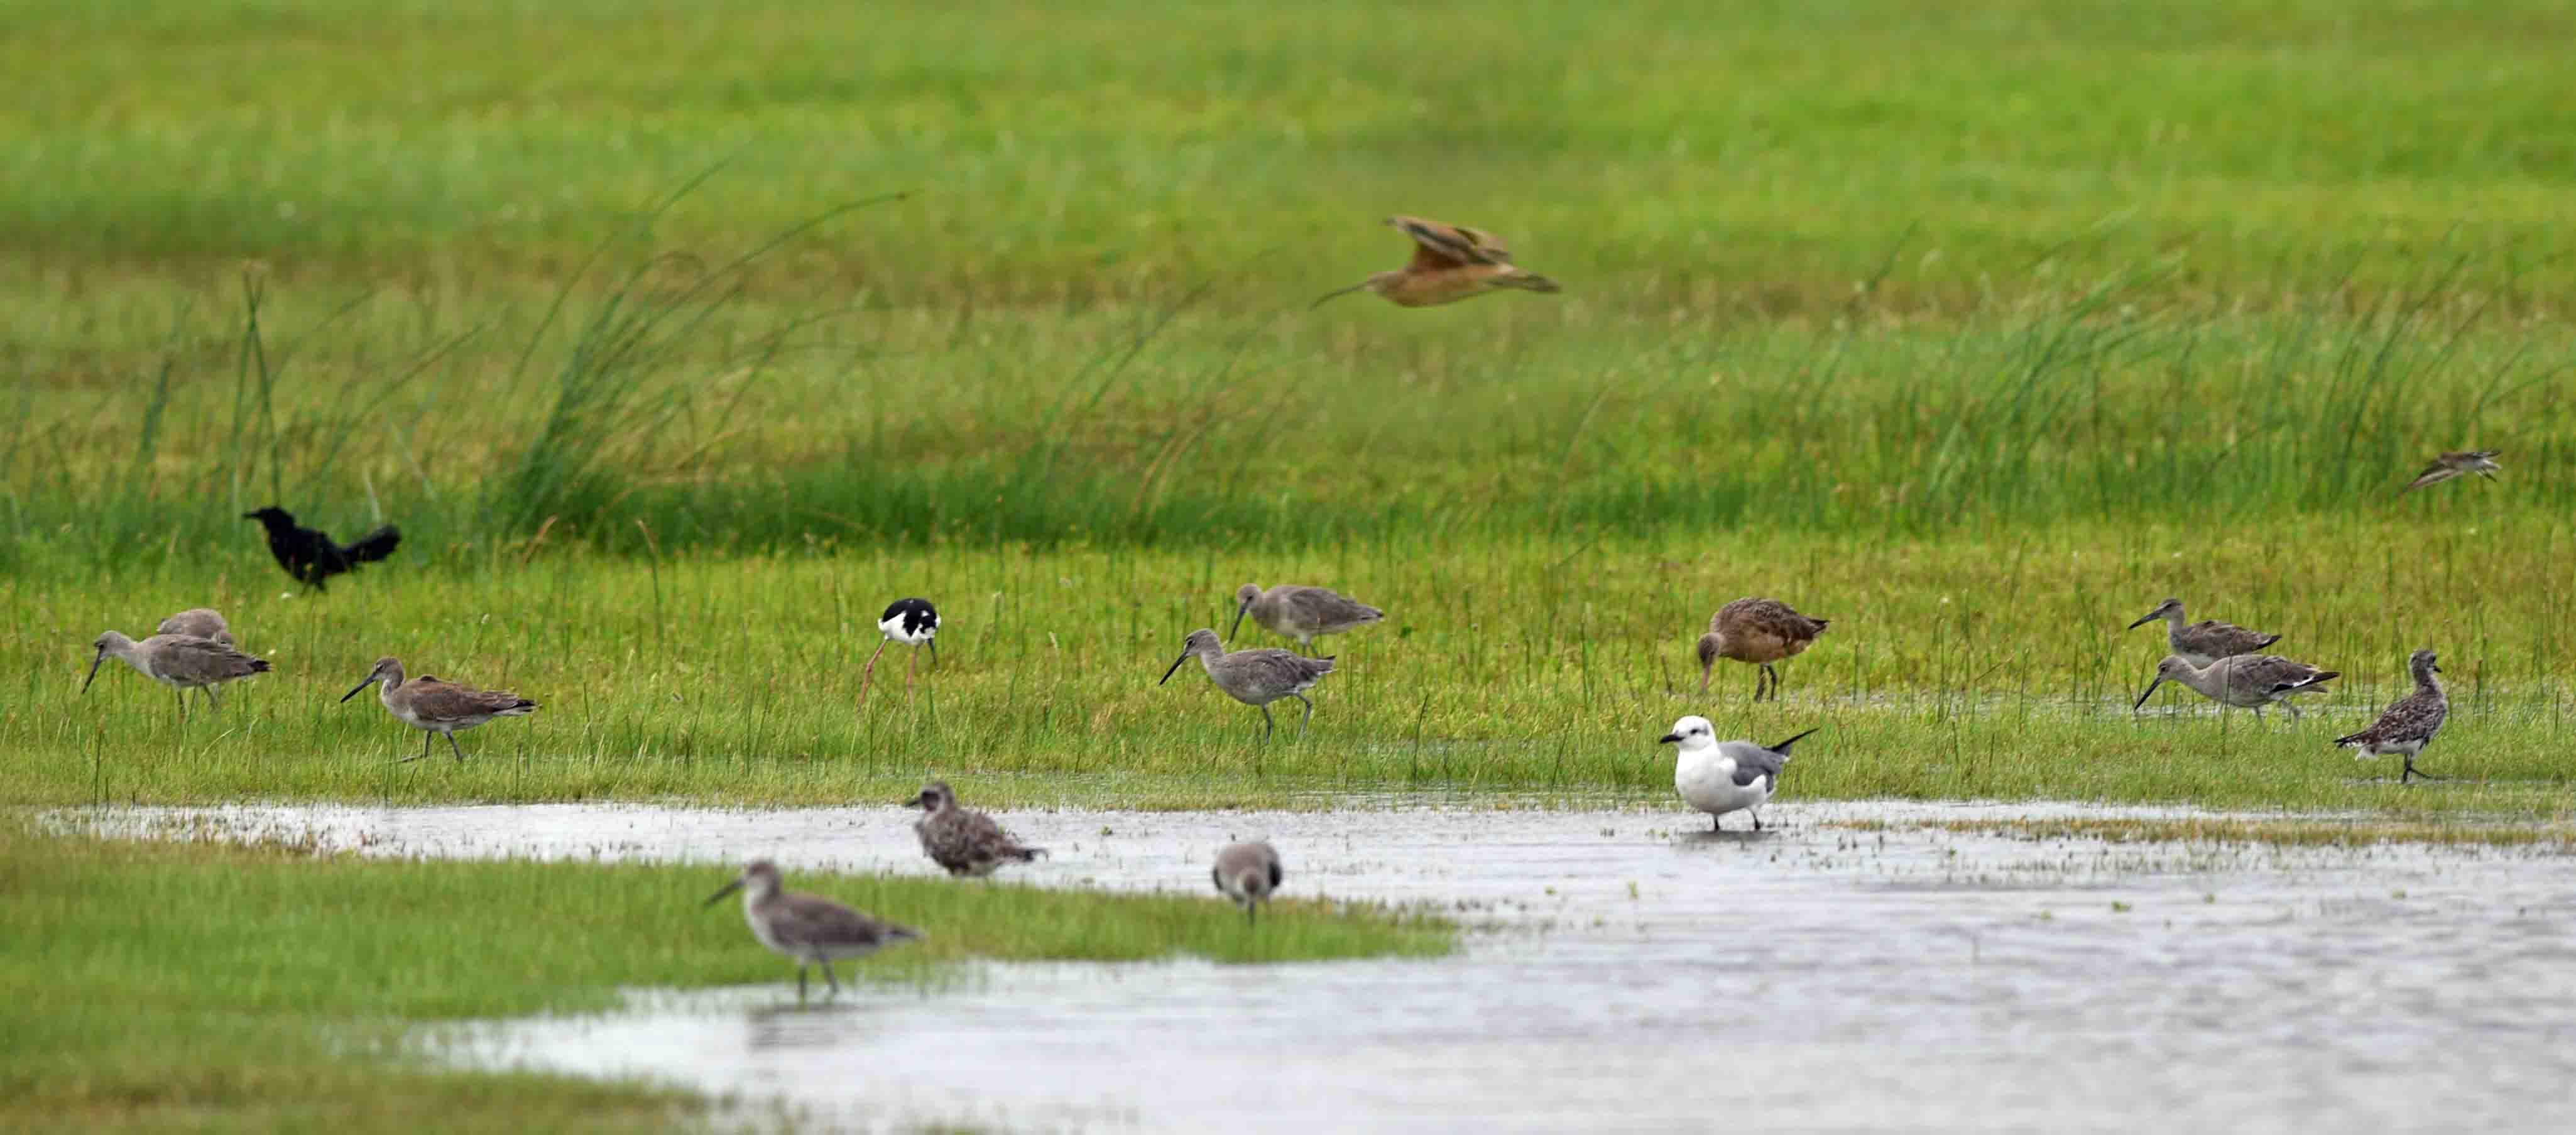 shore birds in water in galveston island texas